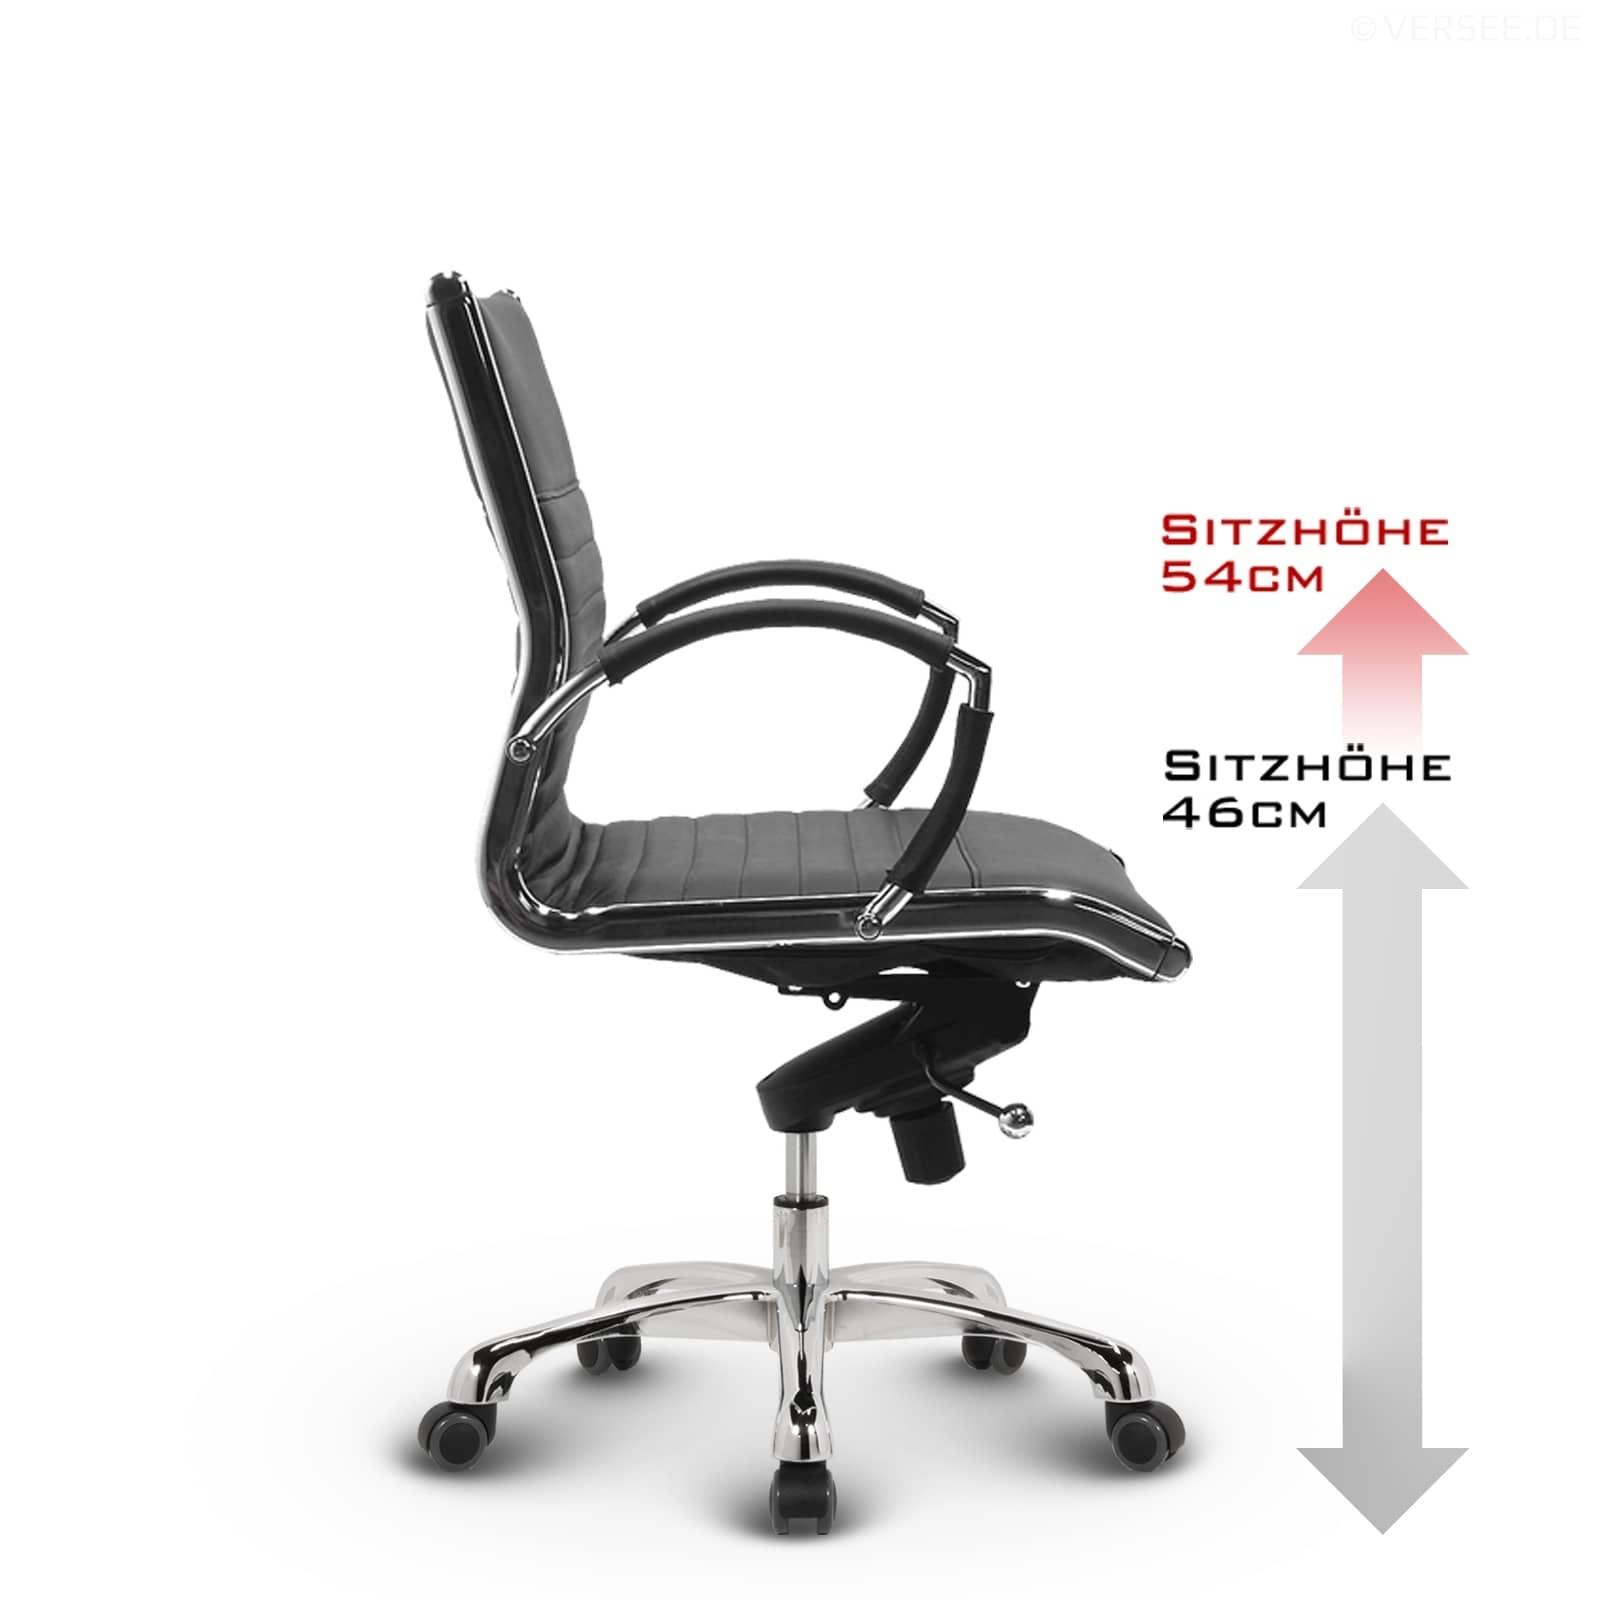 Bürostuhl Drehstuhl Schreibtischstuhl Konferenzstuhl Stoff Chrom Montreal Design